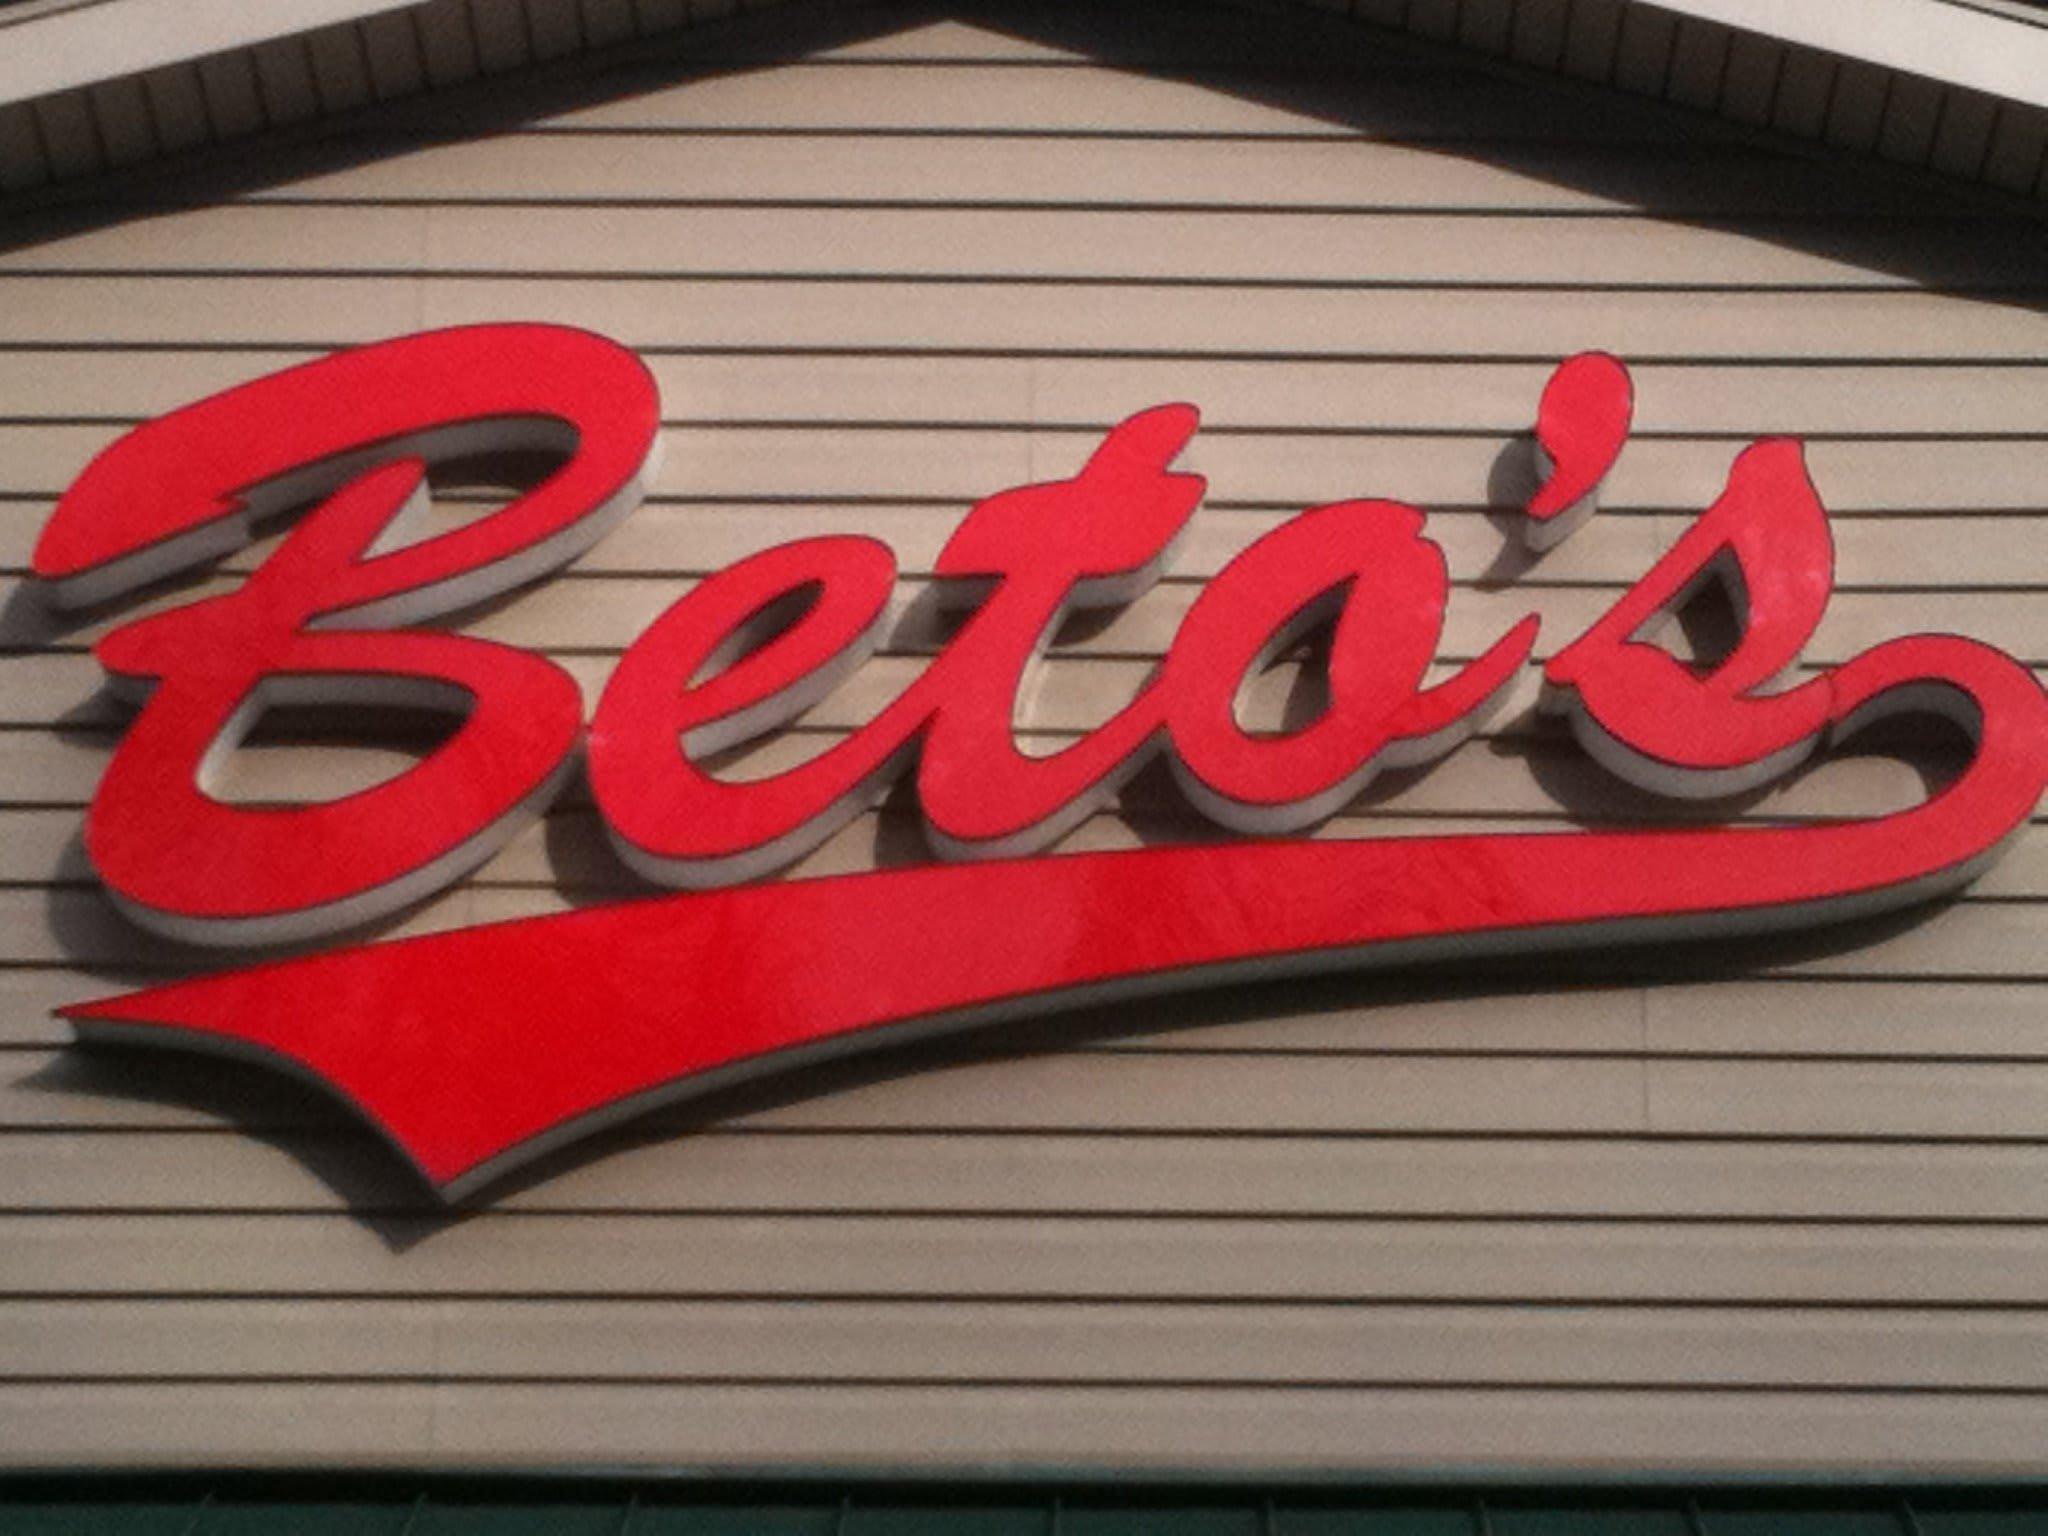 betos at Beto's Pizza & Restaurant